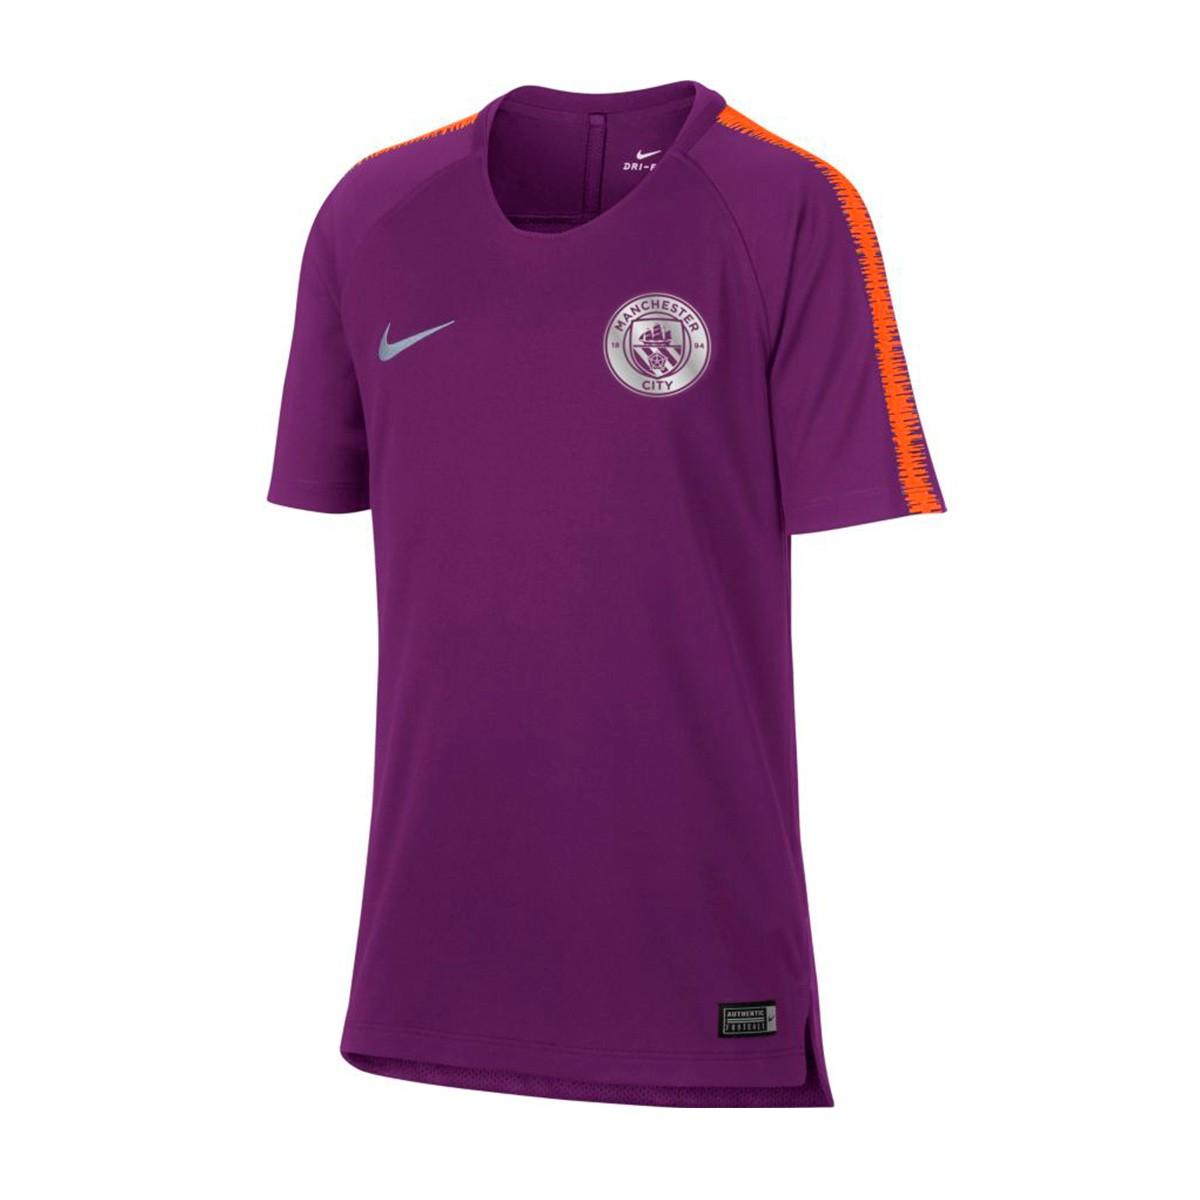 Jersey Nike Kids Manchester City FC Squad 2018-2019 Night purple ... 338258c1f